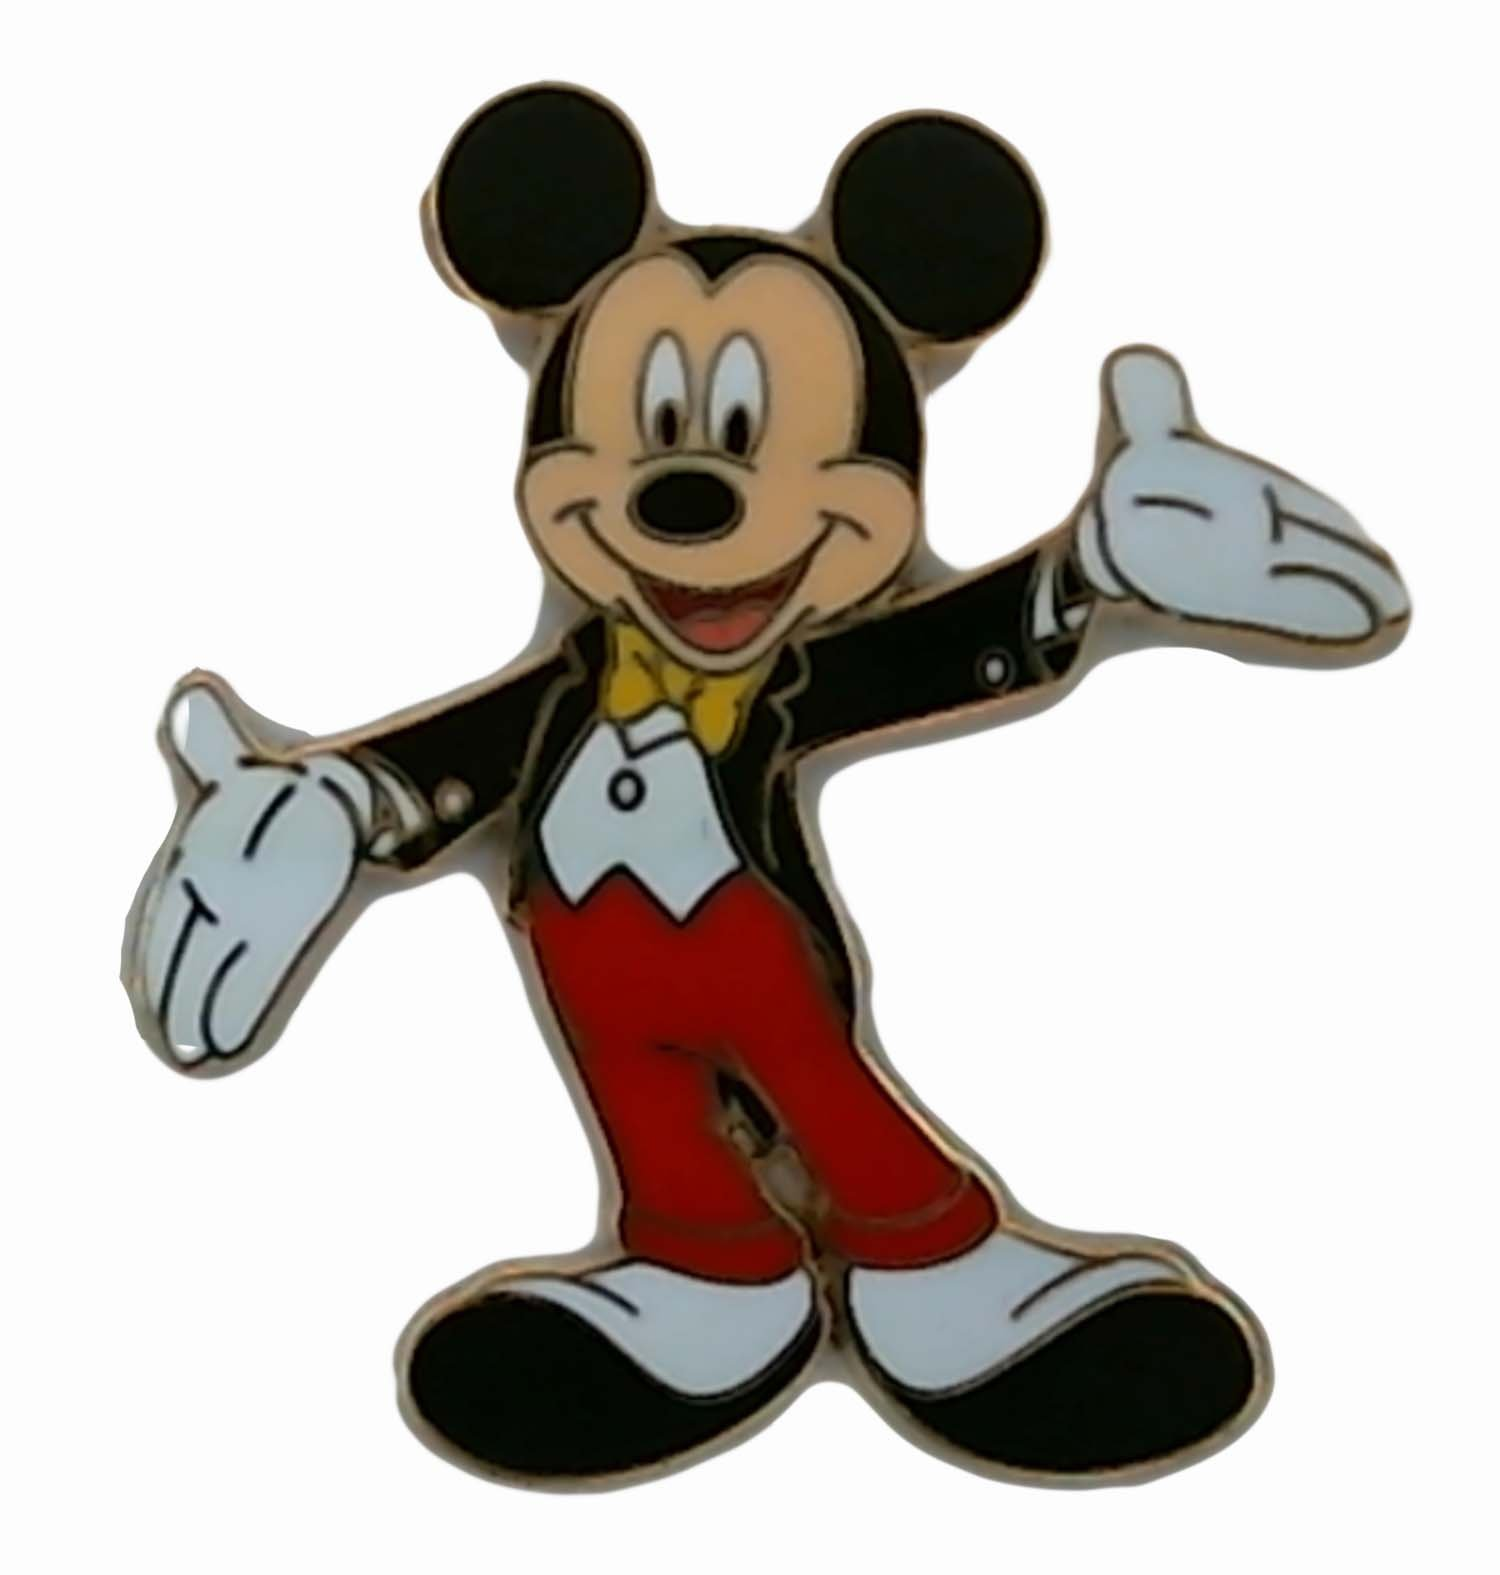 Disney Pin - Mickey Mouse in Tuxedo - Pin 43627